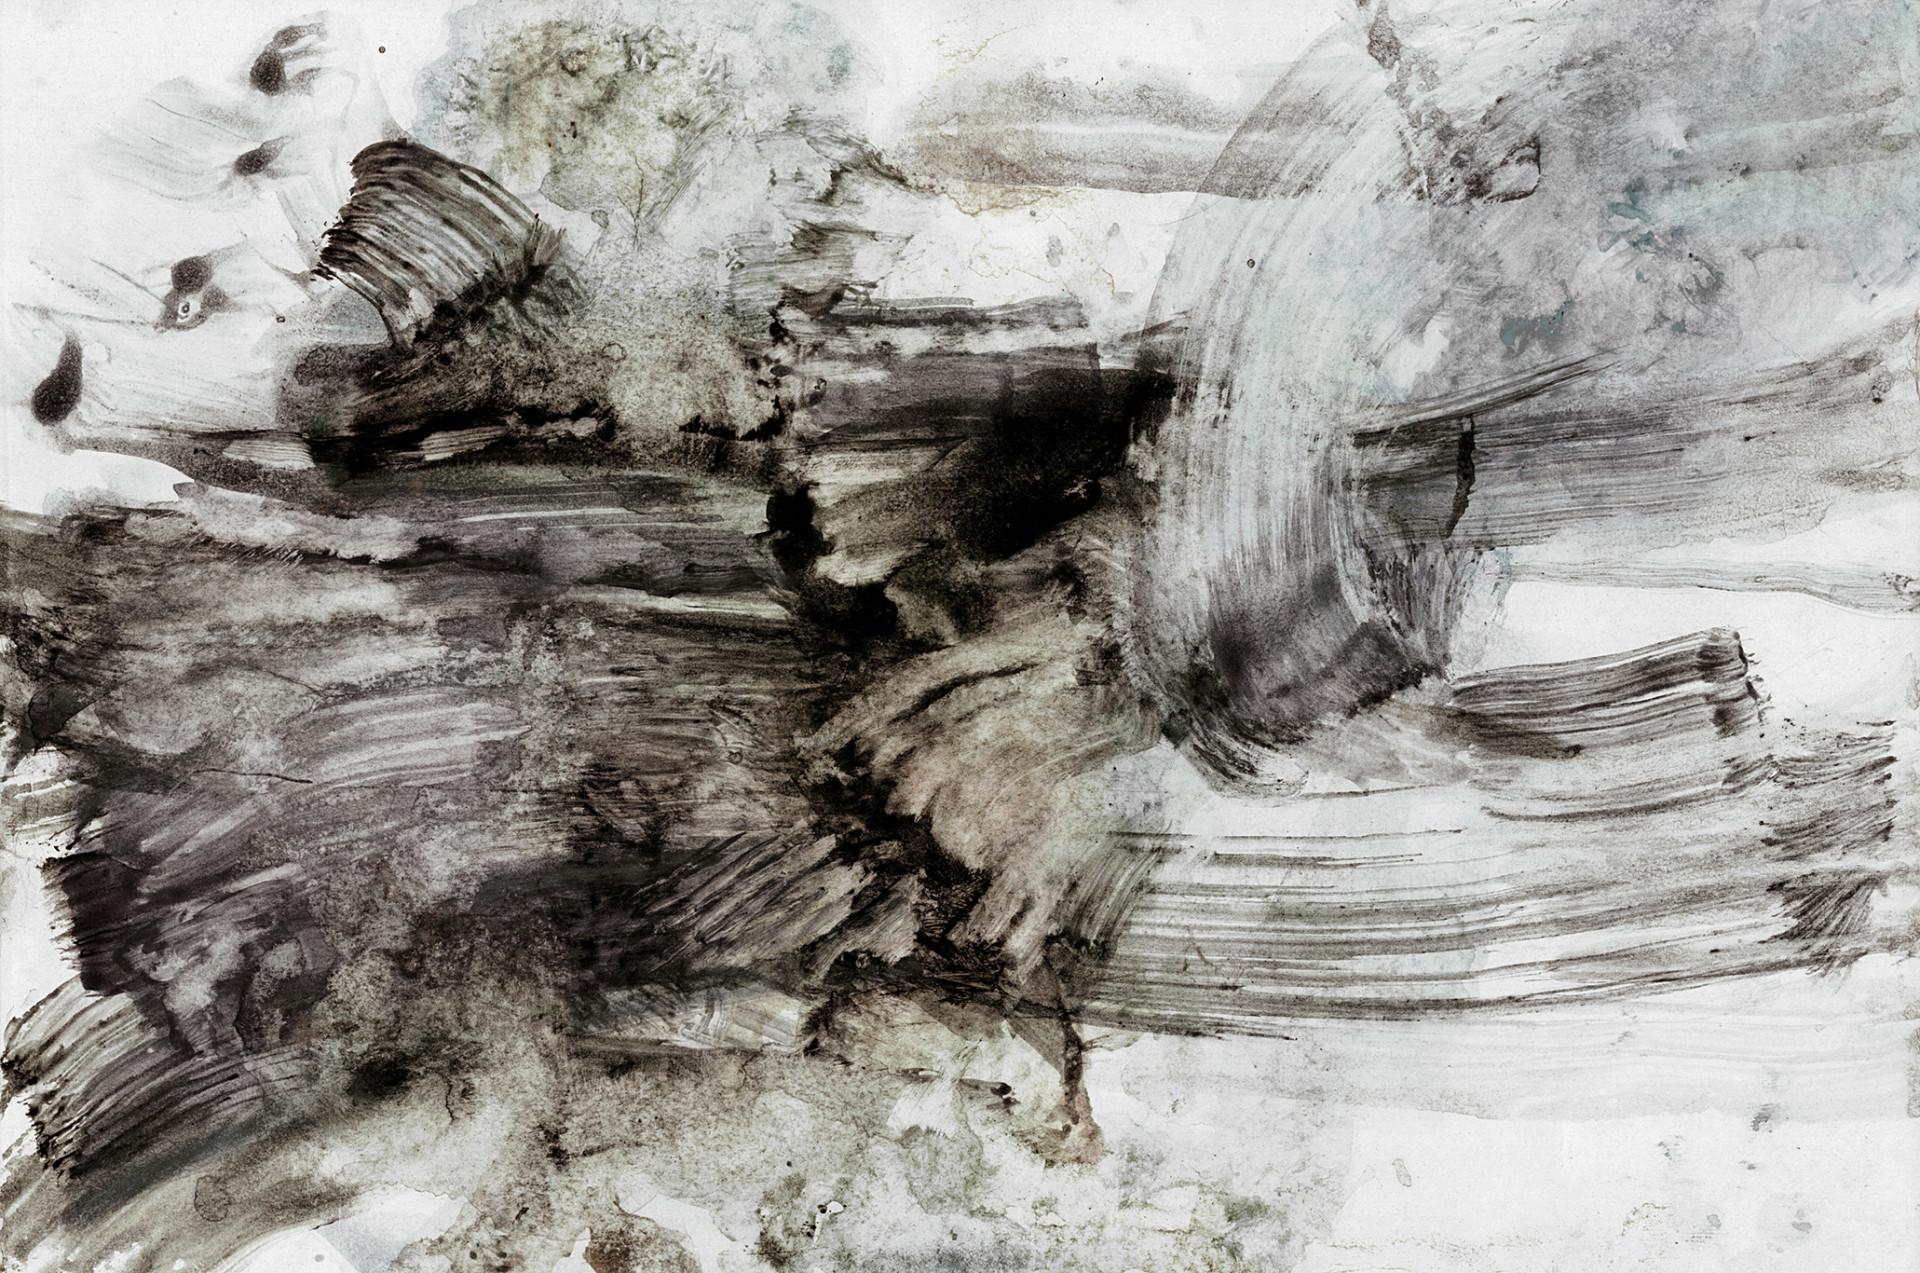 - 150 x 210 - oil on canvas 2011